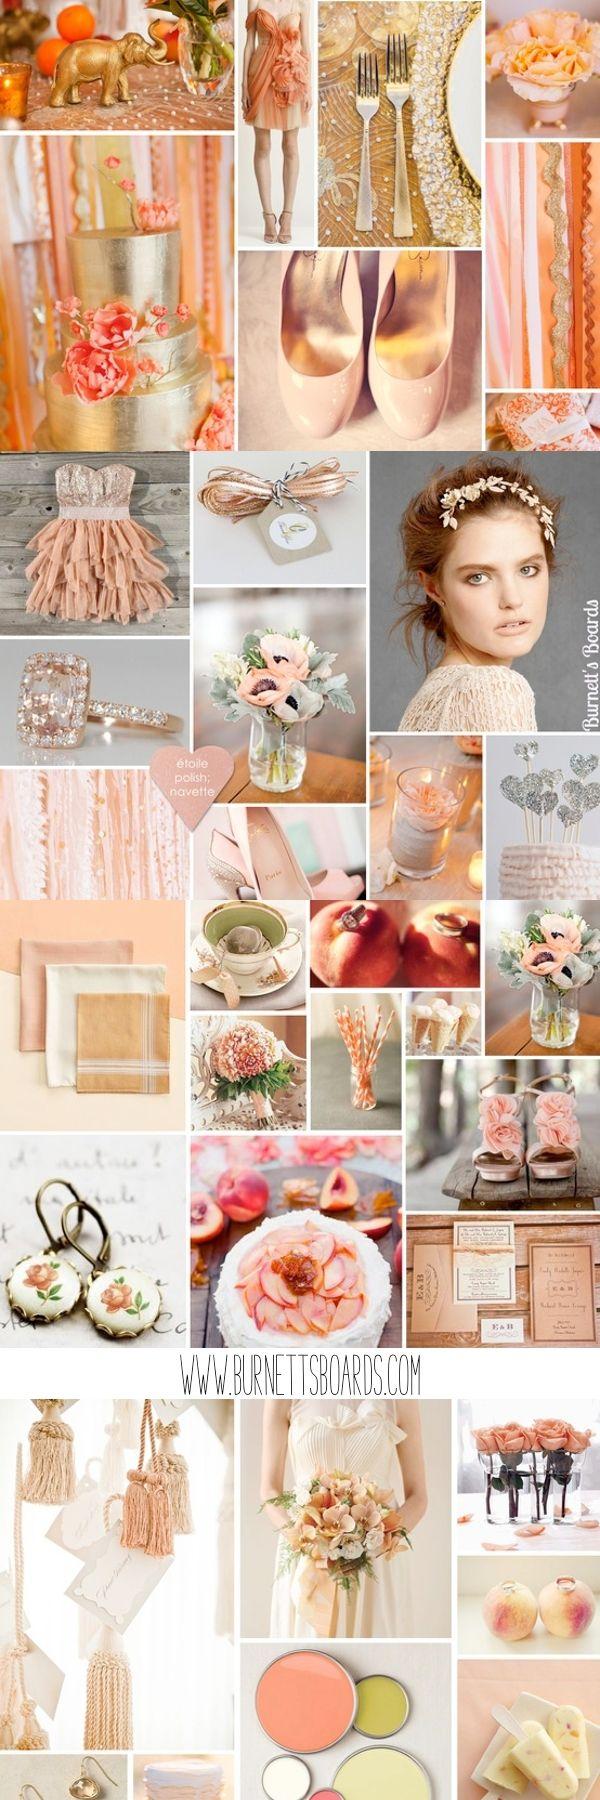 Peach Wedding Inspiration ~ #peach #wedding #inspiration @WedFunApps wedfunapps.com ♥'d via BurnettsBoards